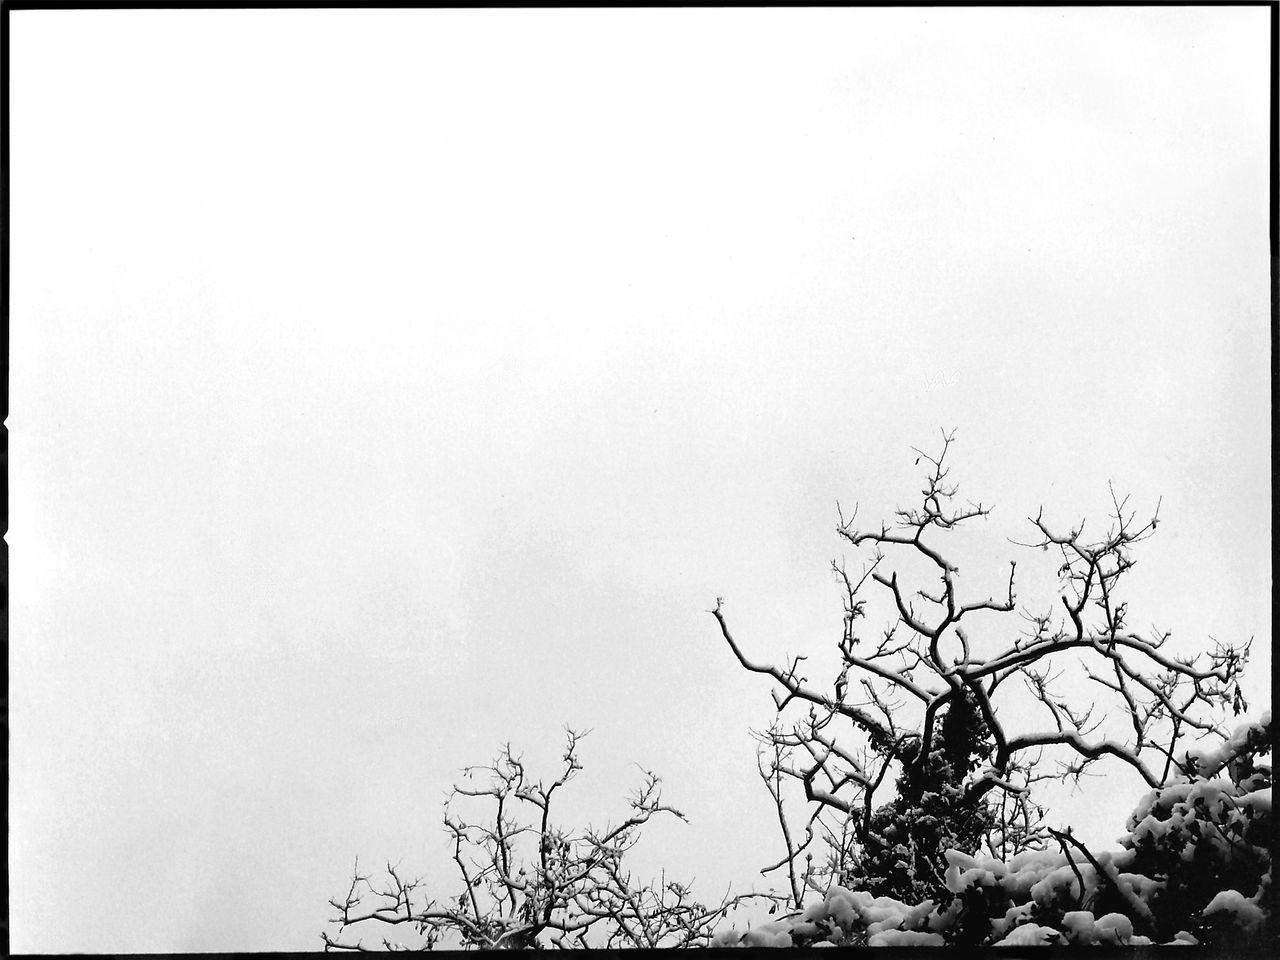 120 Film Beauty In Nature Blackandwhite Blancoynegro Branch Collcerola Film Photography Hasselblad Outdoors Sky Snow ❄ Tree Treetop